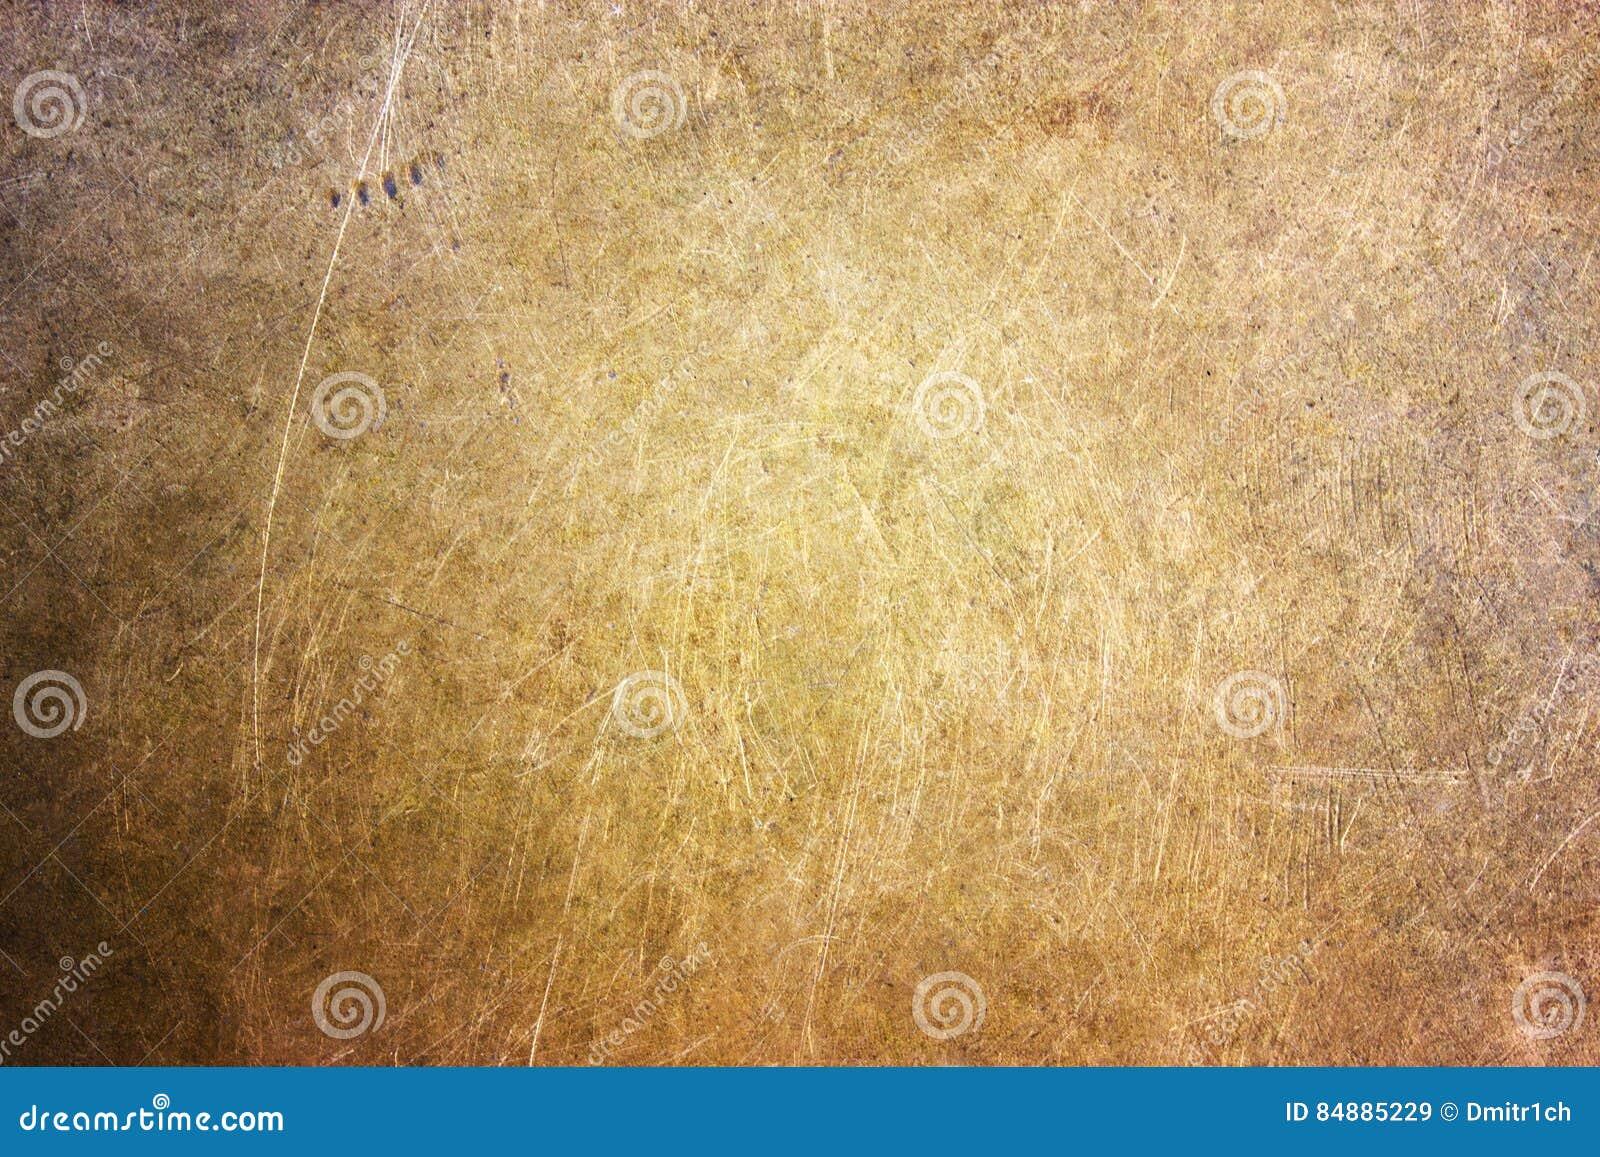 Bronze Leaf, Metallic Texture Of Golden Color Stock Image - Image of ...